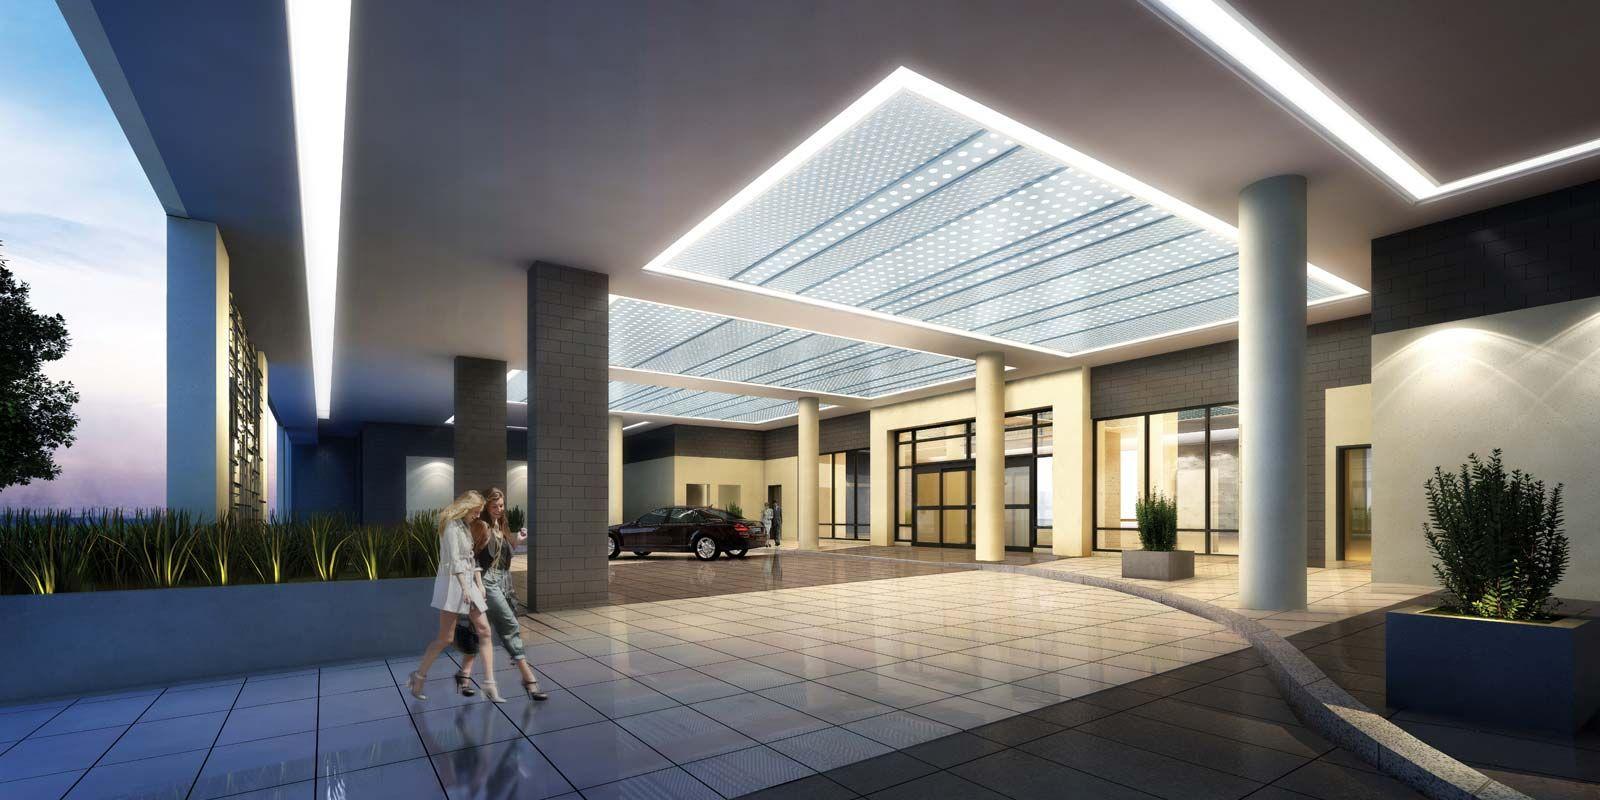 Hotel Porte Cochere Modern Google Search Entries